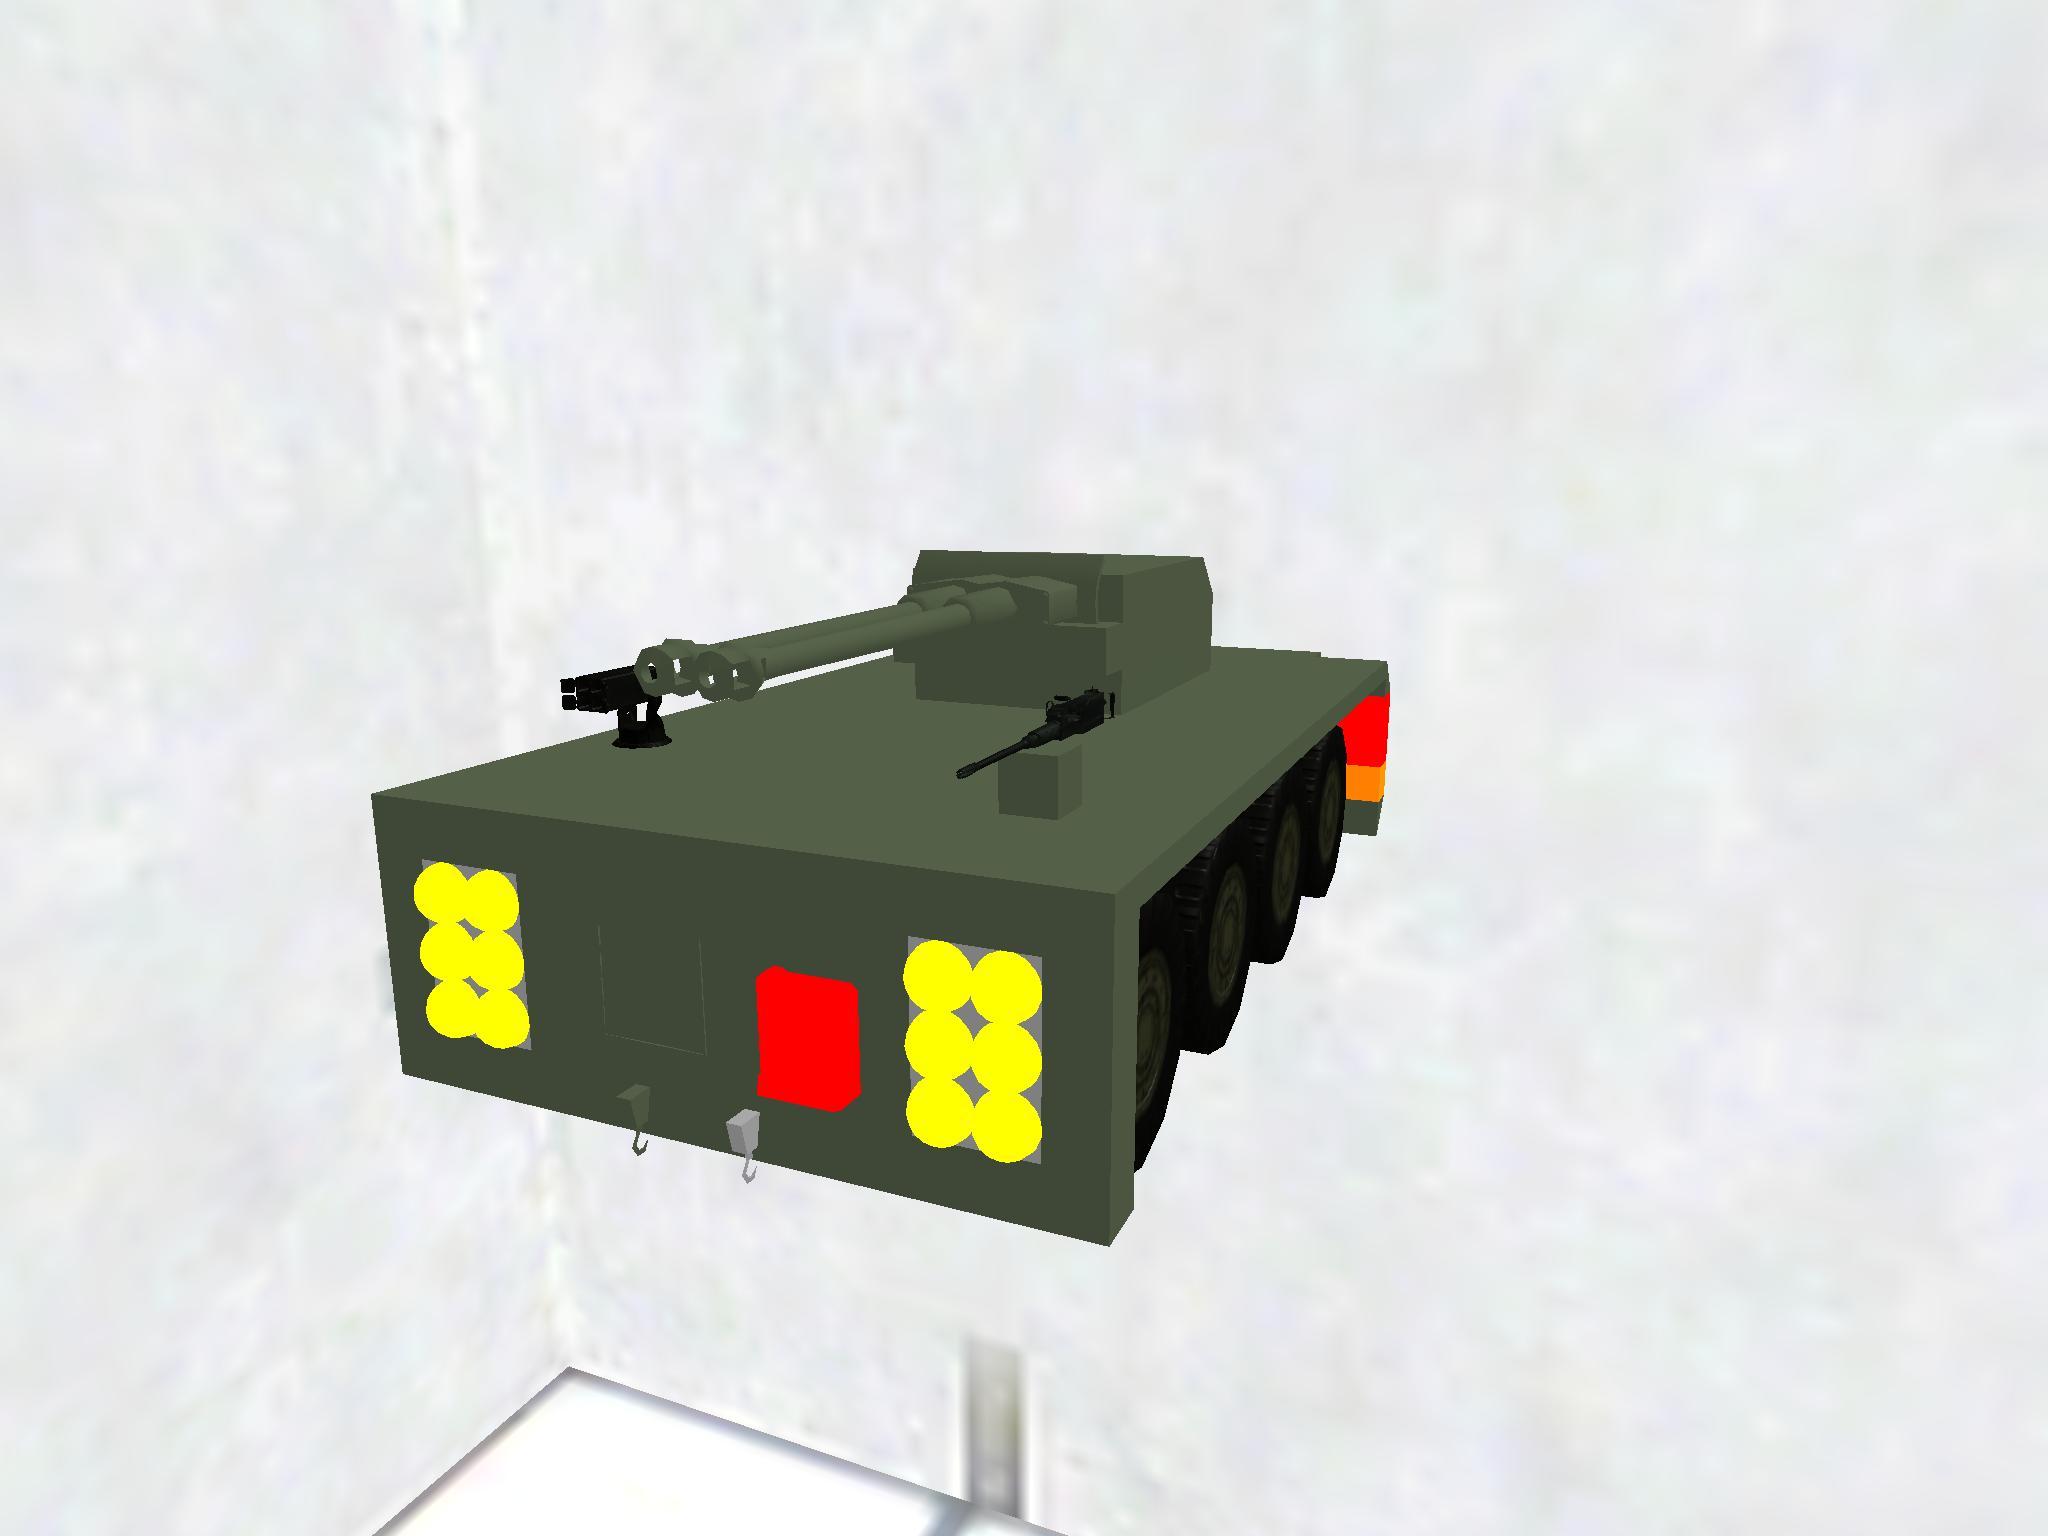 PanzerWagen P-100